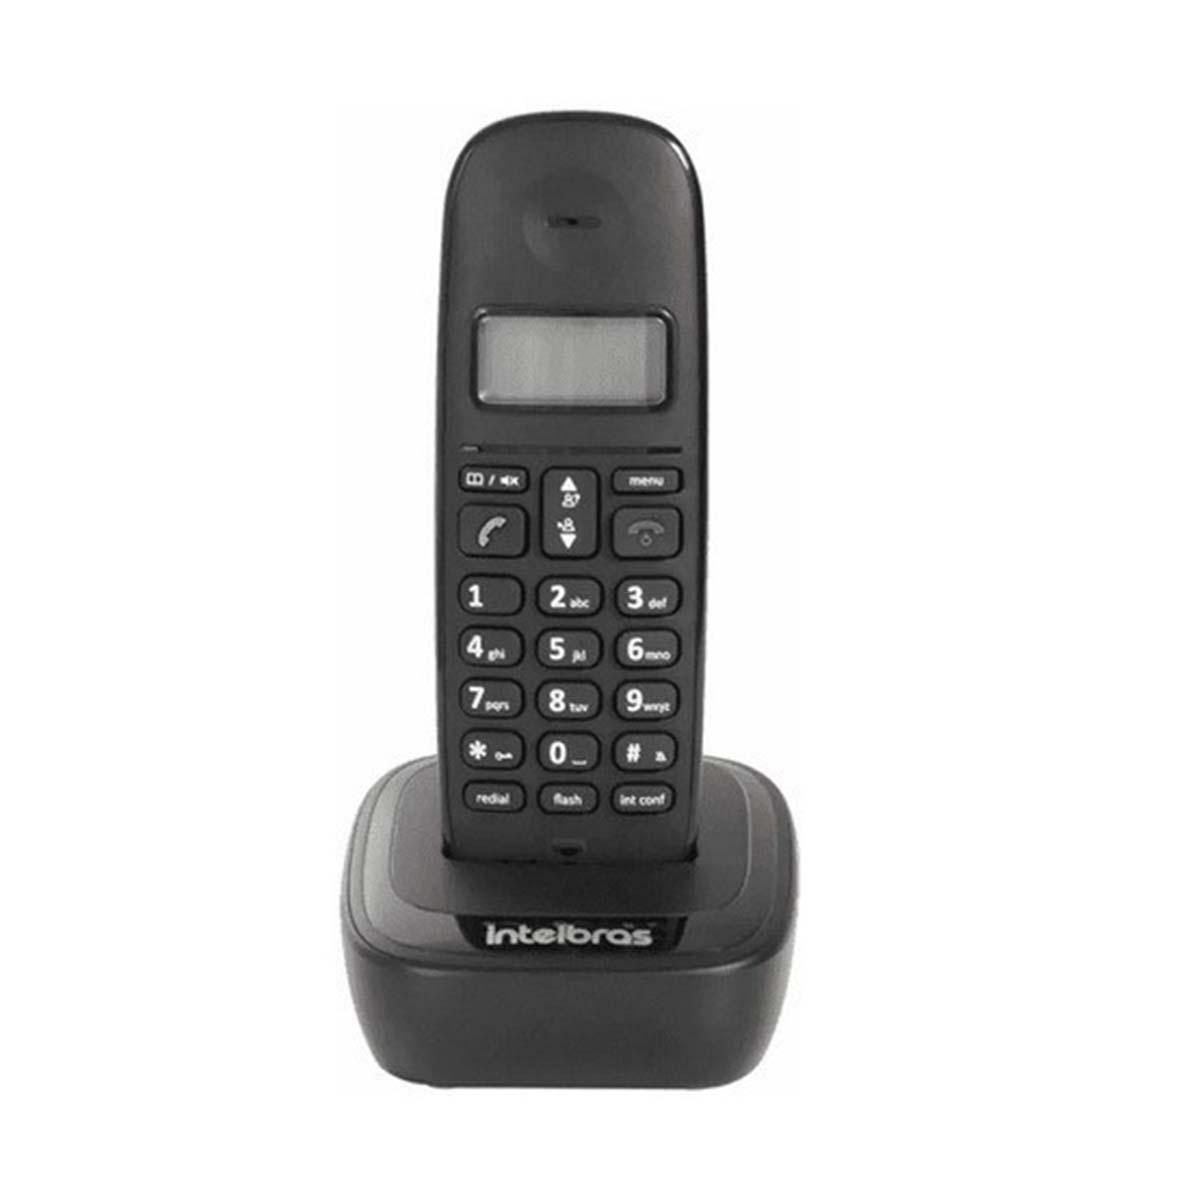 Kit 04 Telefone Sem Fio Intelbras Ts 2510 Preto